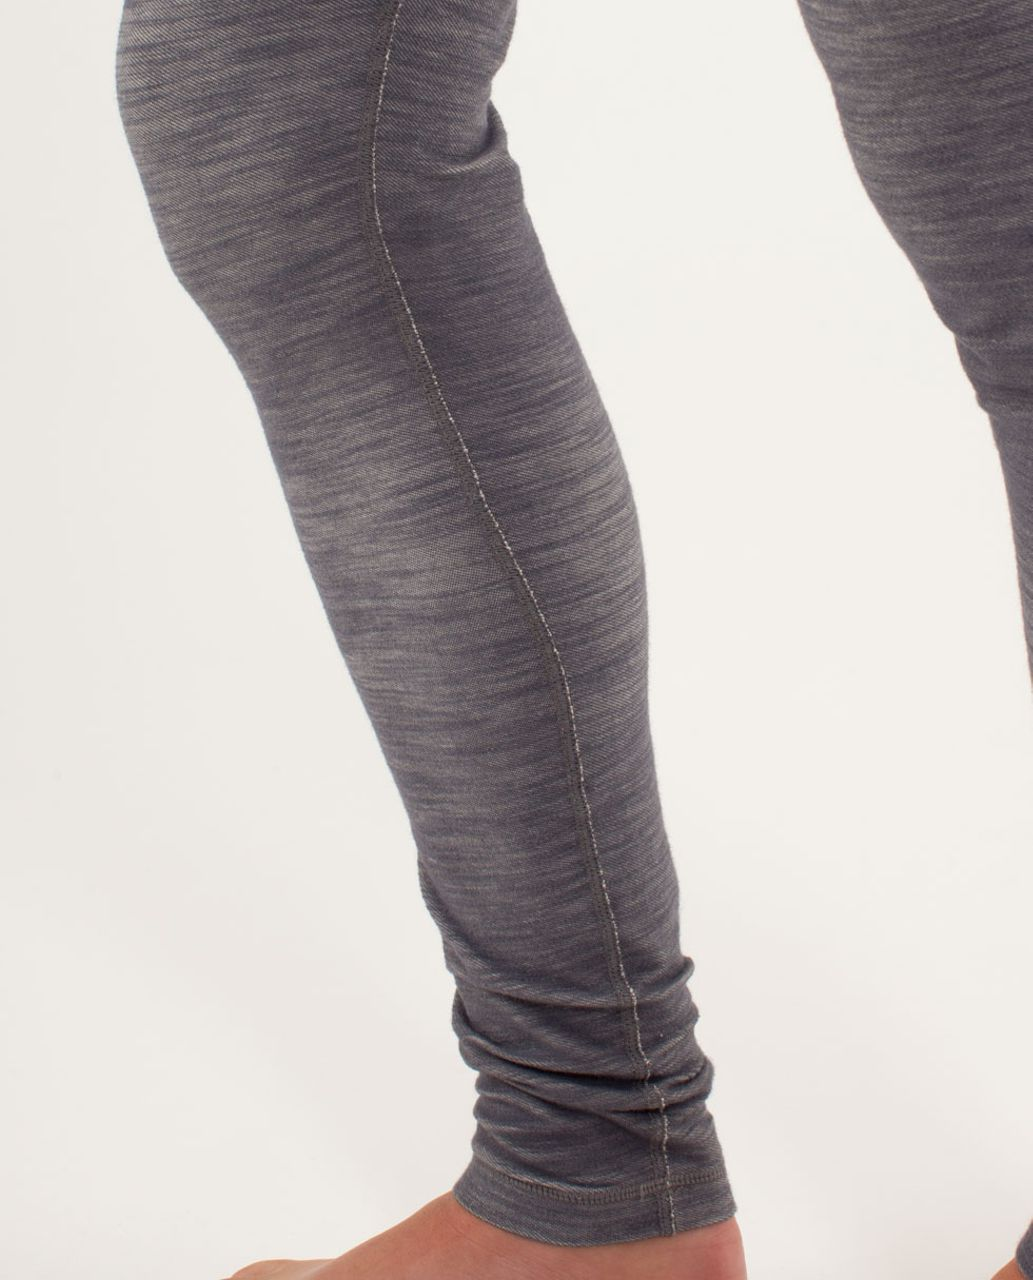 Lululemon Wunder Under Pant *Denim - Cashew Coal Slub Denim